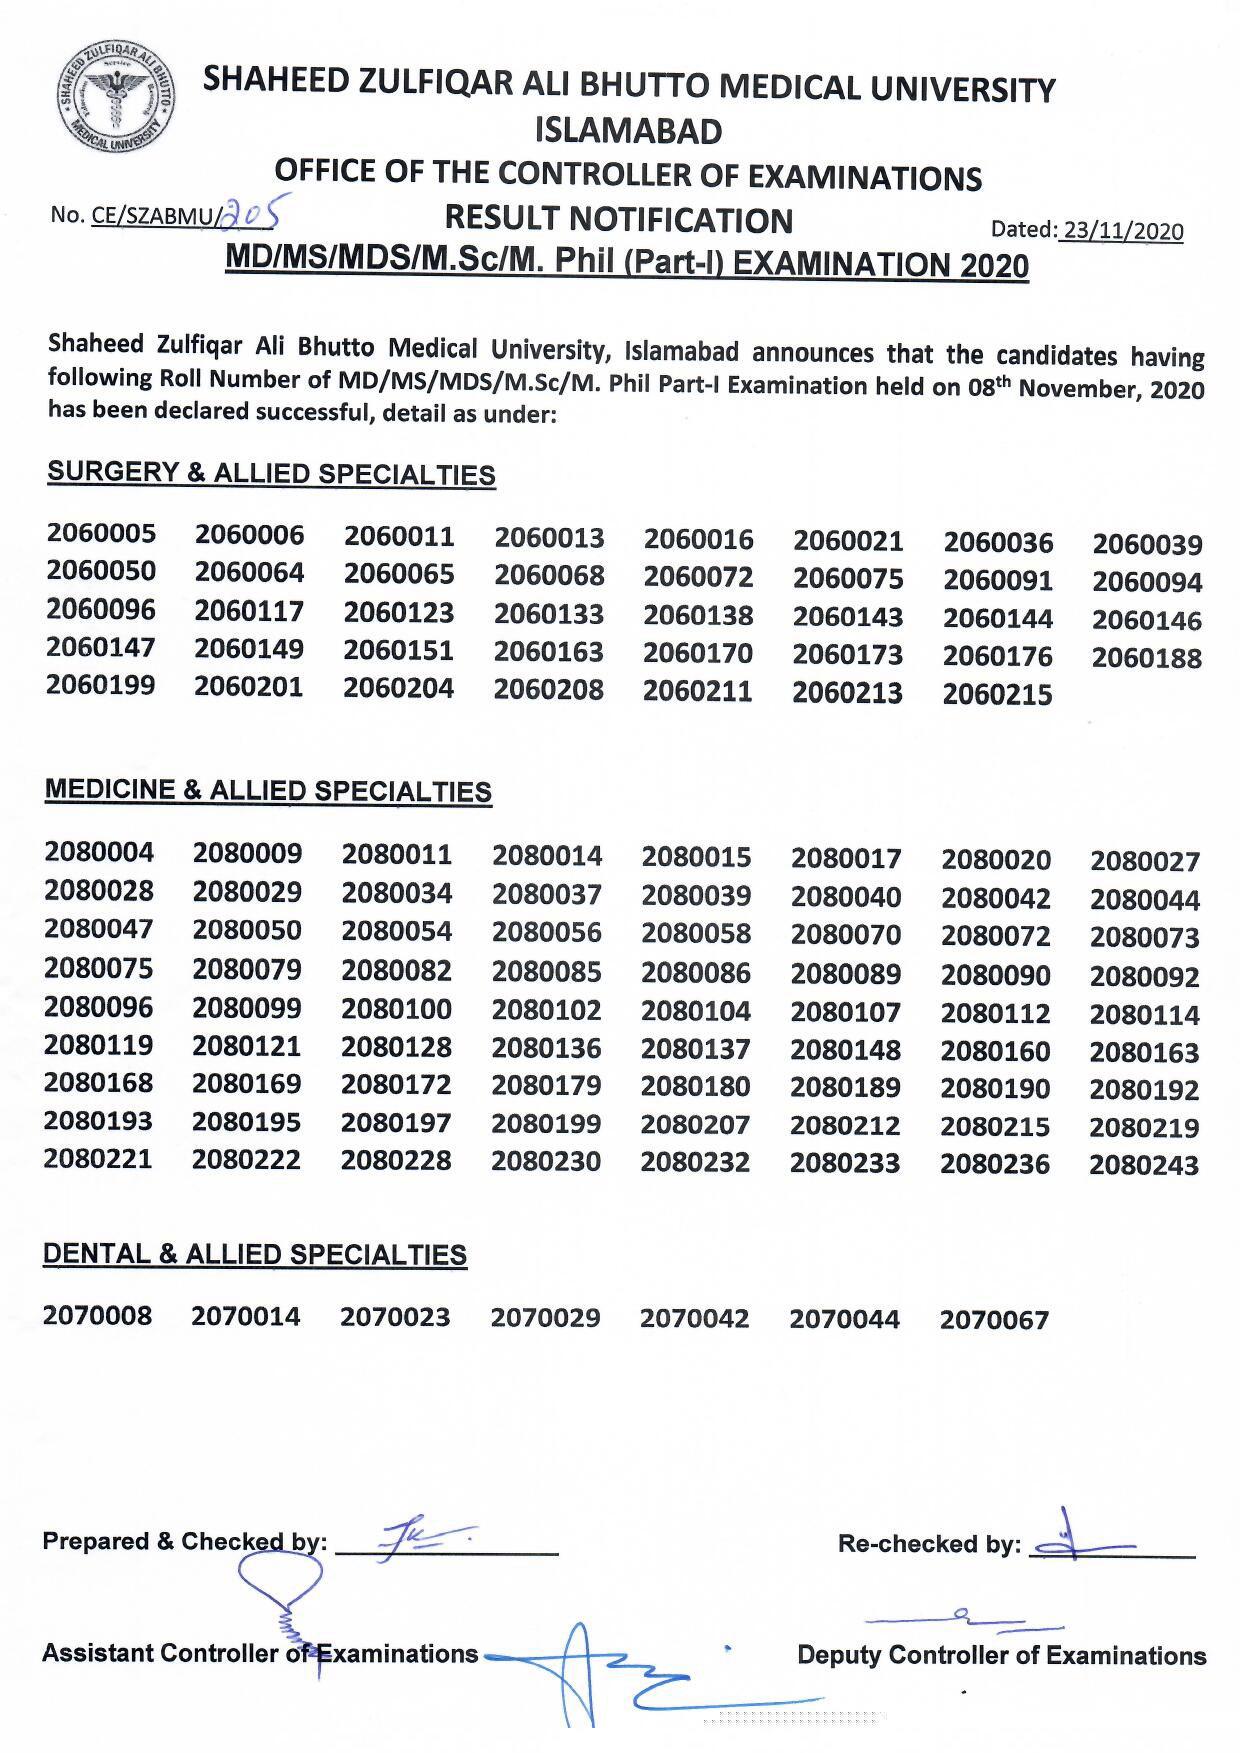 Result Notification MS/ MD/ MDS Part-I Exam 2020